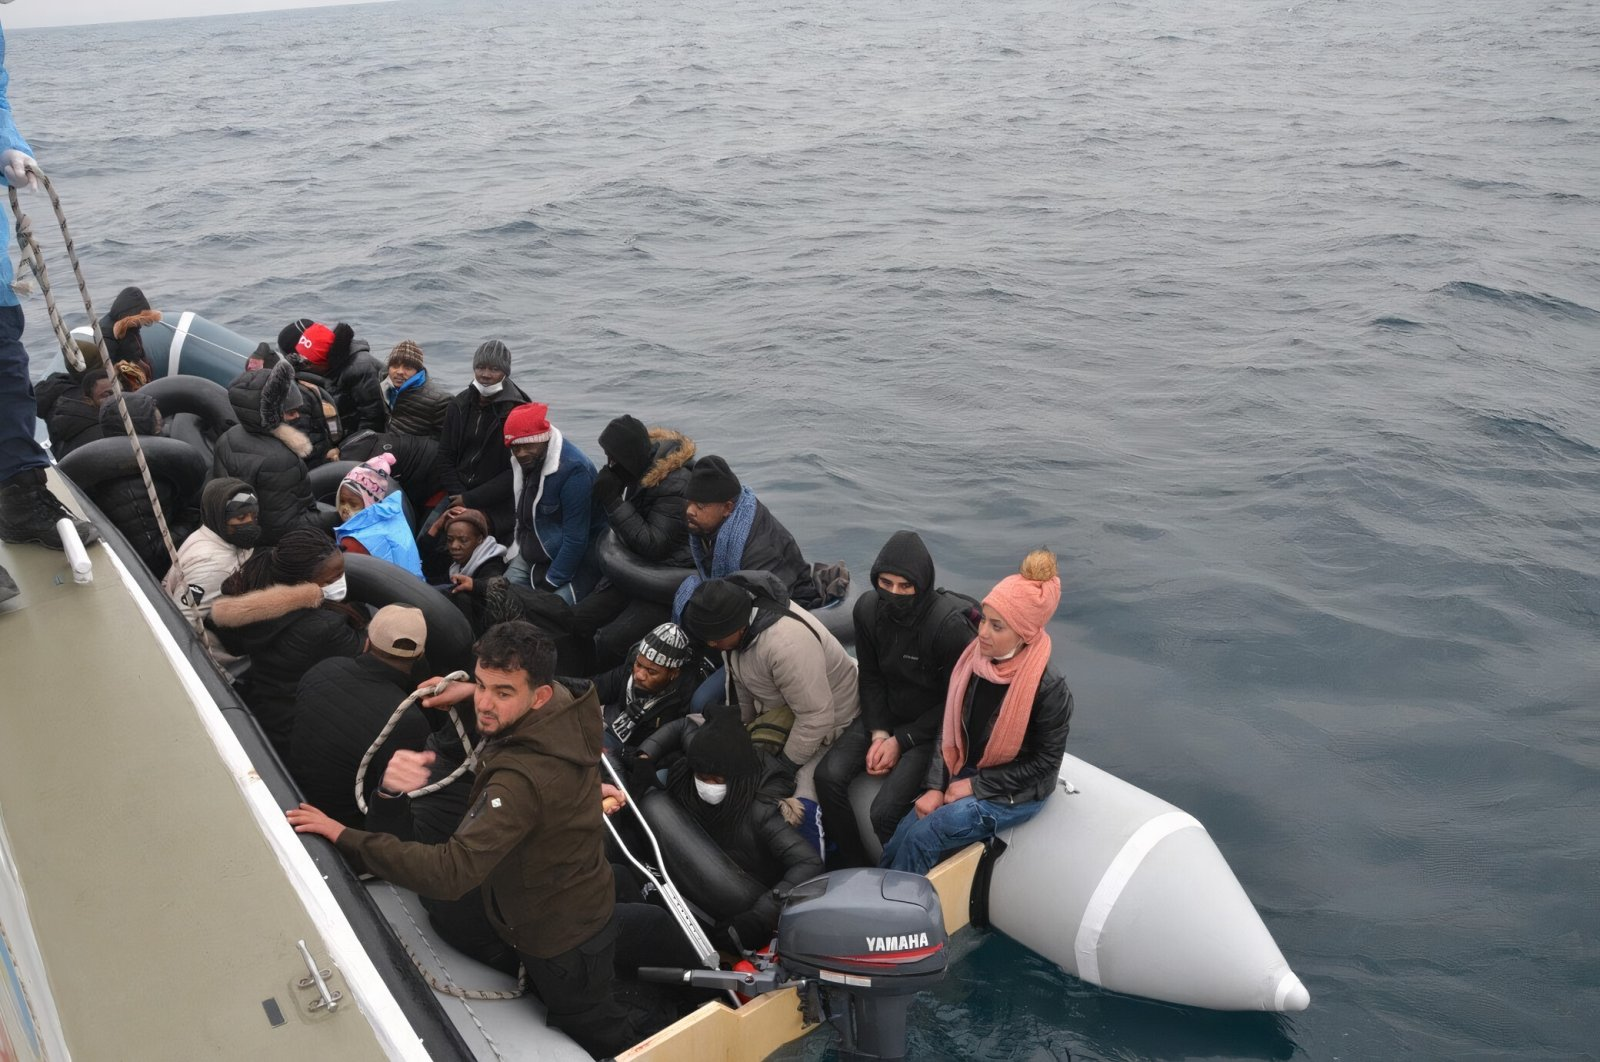 31 irregular migrants pushed back by Greek forces being rescued in western Balıkesir province's Ayvalık district, Turkey, Feb. 26, 2021 (DHA Photo)